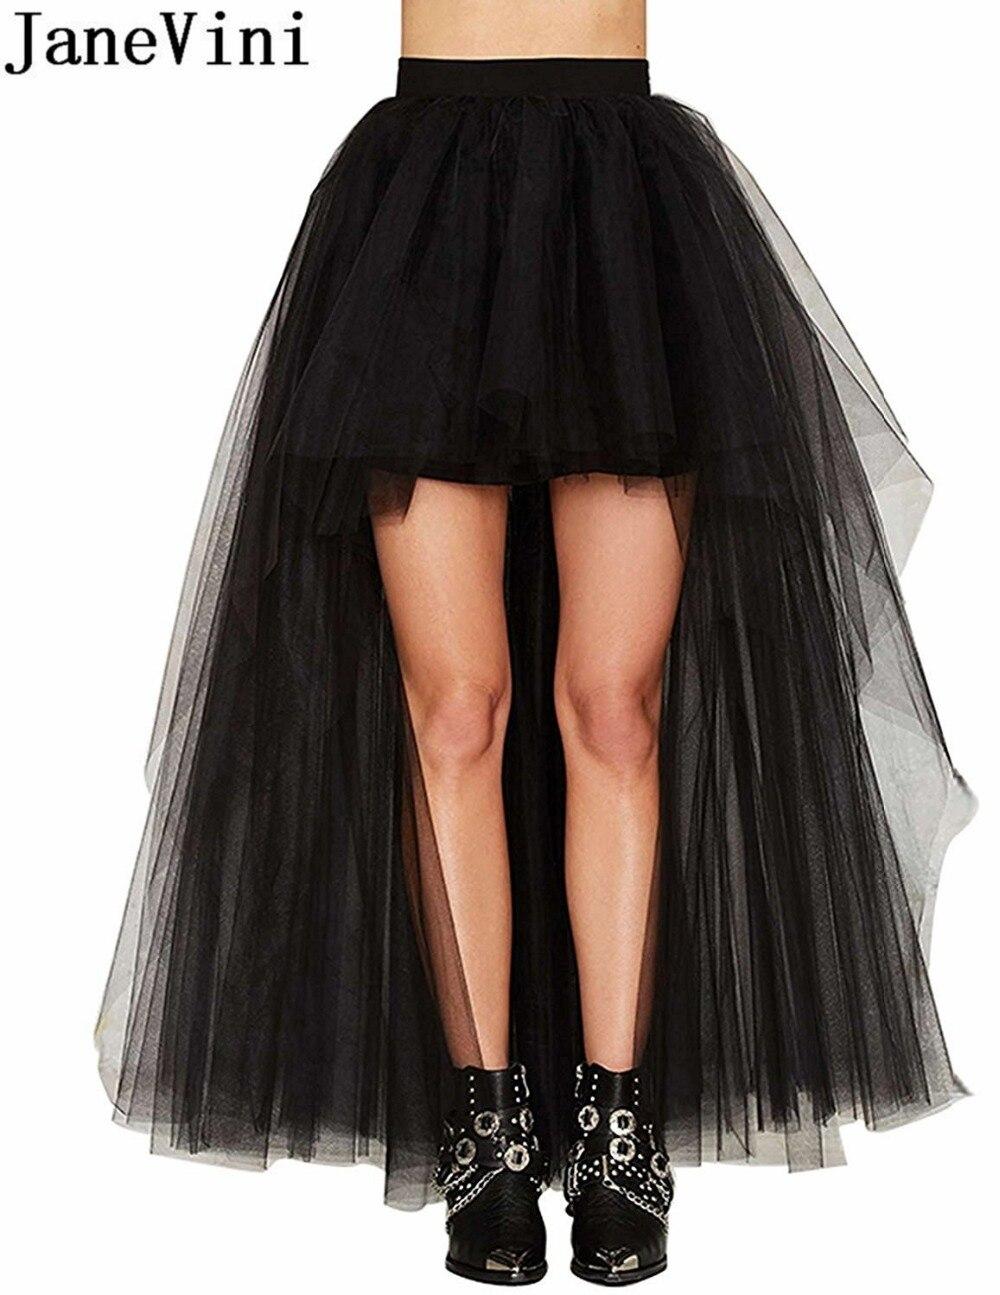 232586c8c JaneVini alto bajo tul Crinoline Rockabilly enaguas Cosplay boda novia  enaguas para vestidos enaguas ...